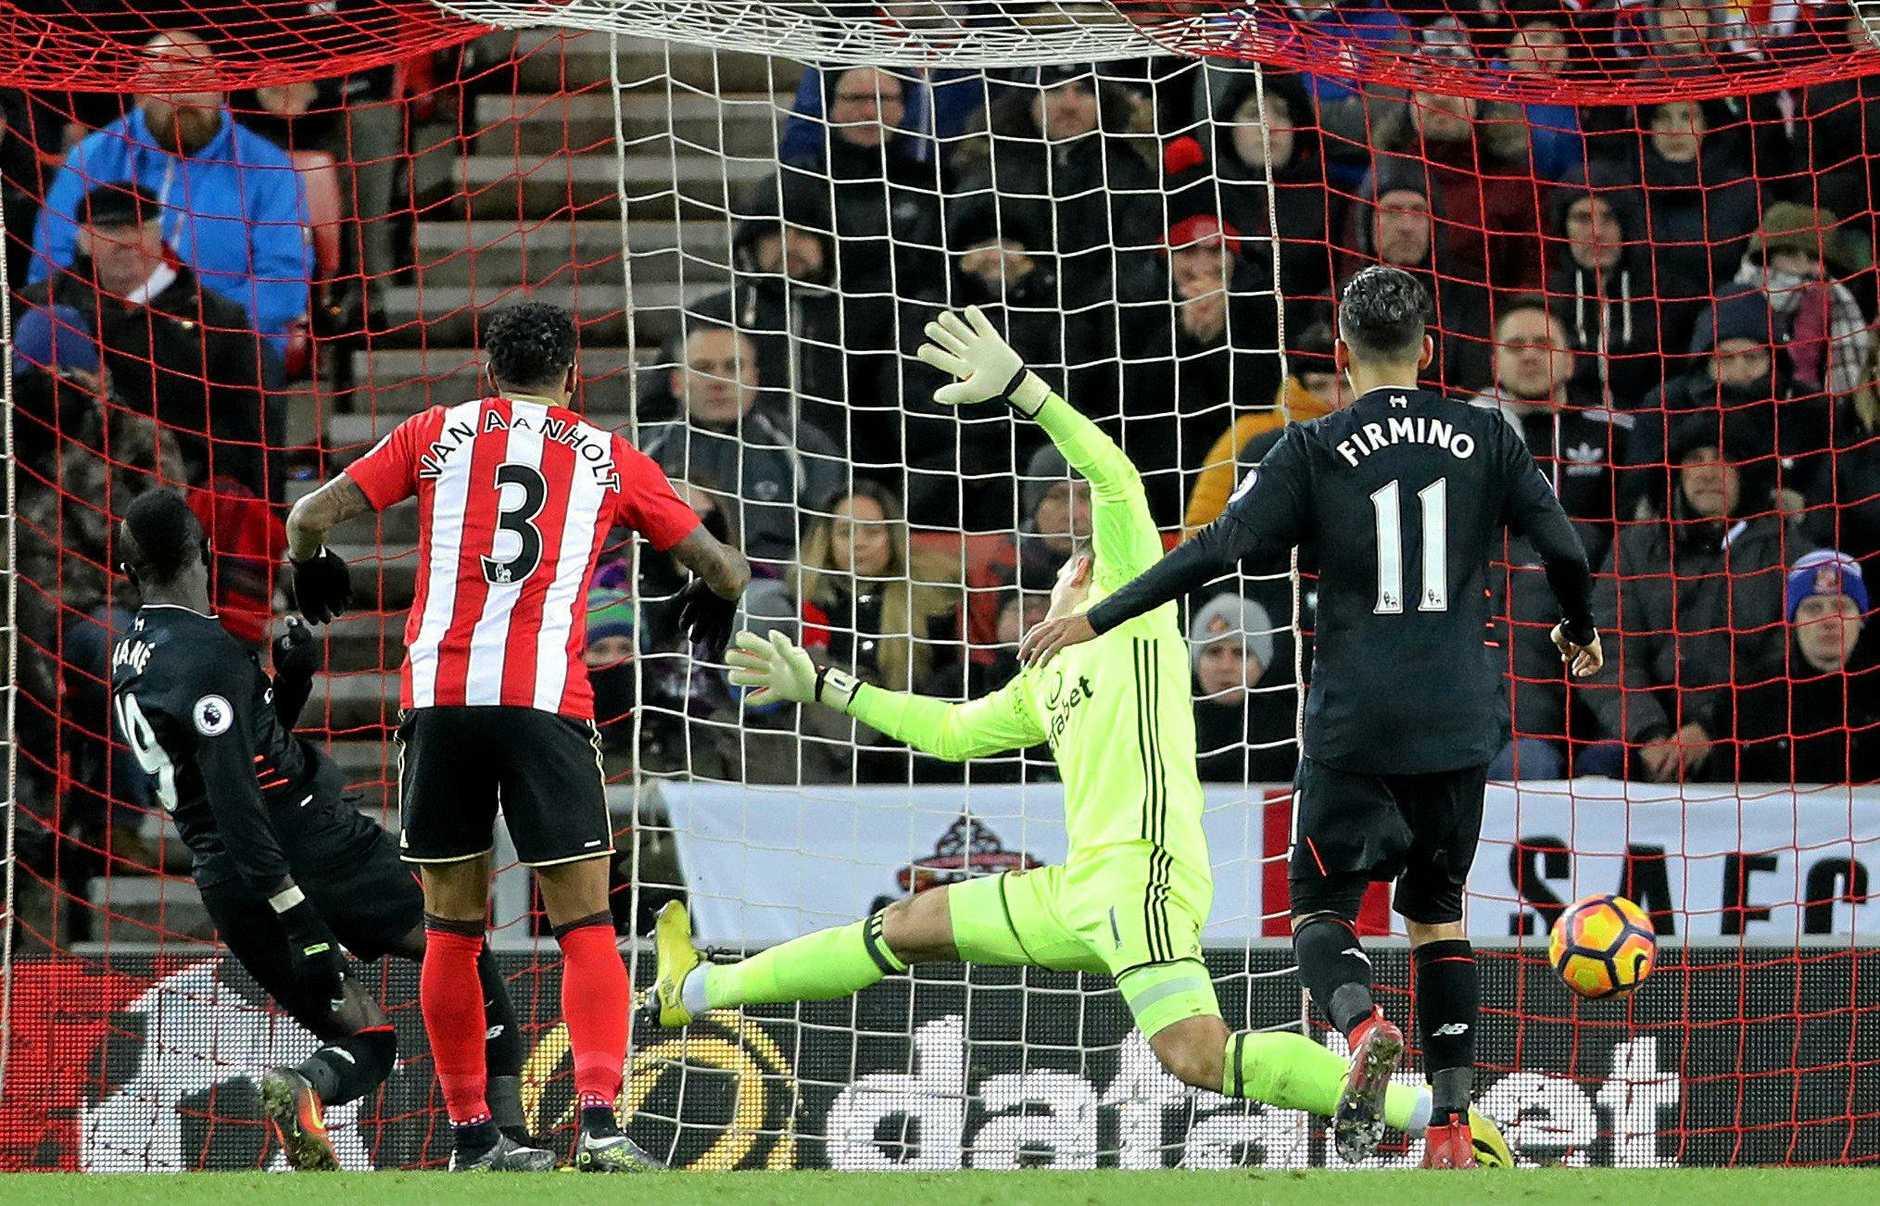 Liverpool's Sadio Mane (left) scores his side's second goal against Sunderland.